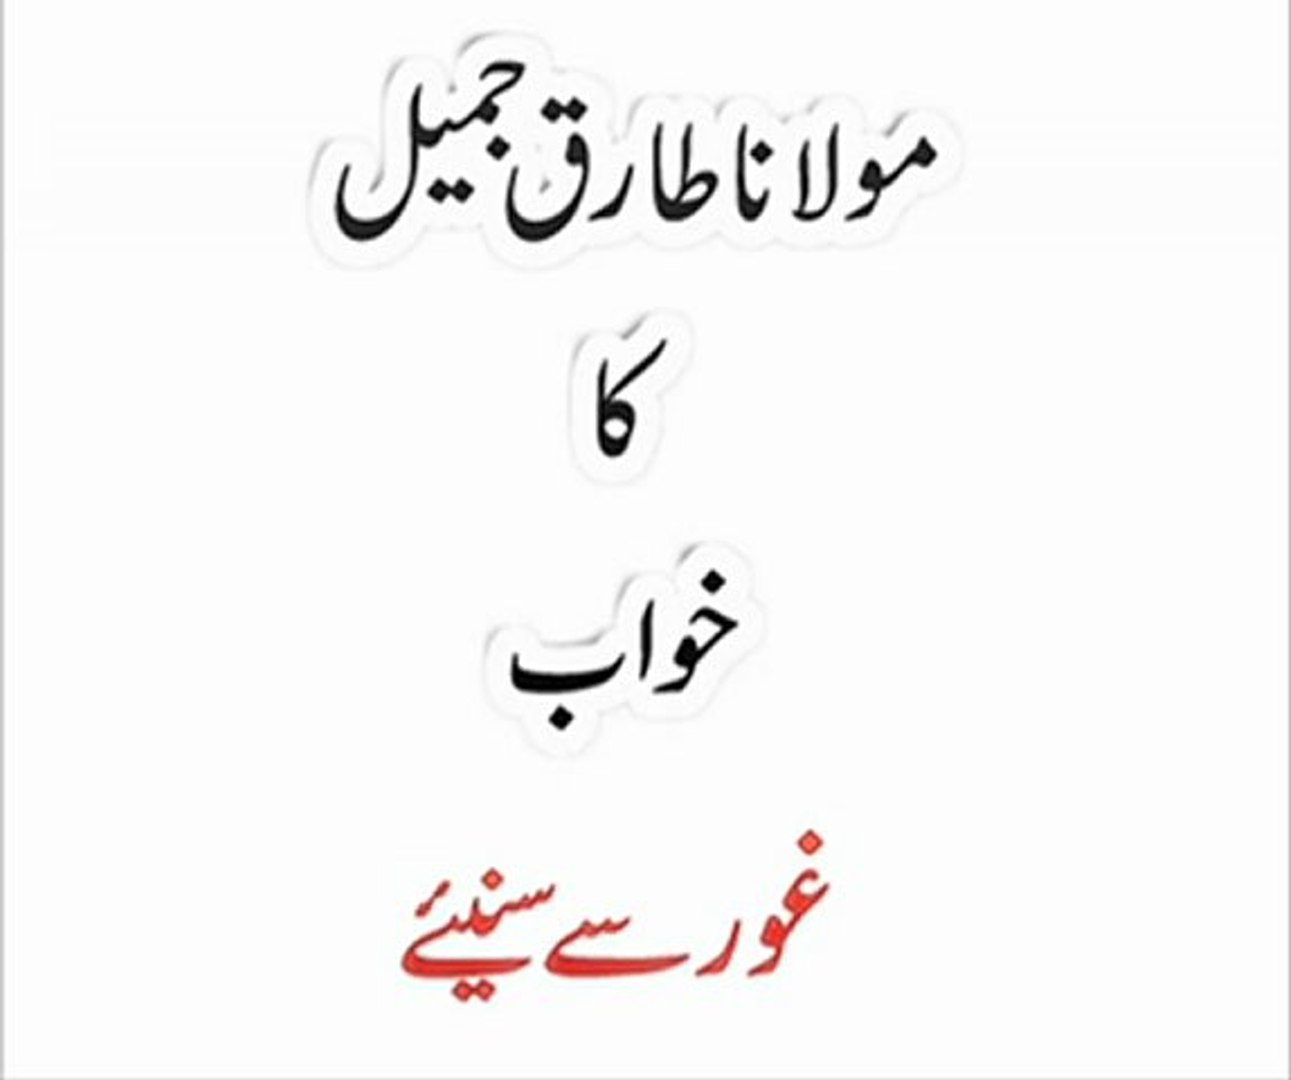 Mulana TariQ  Jameel Ka Khuwab by Akmal_ufone +92 333 686 1111